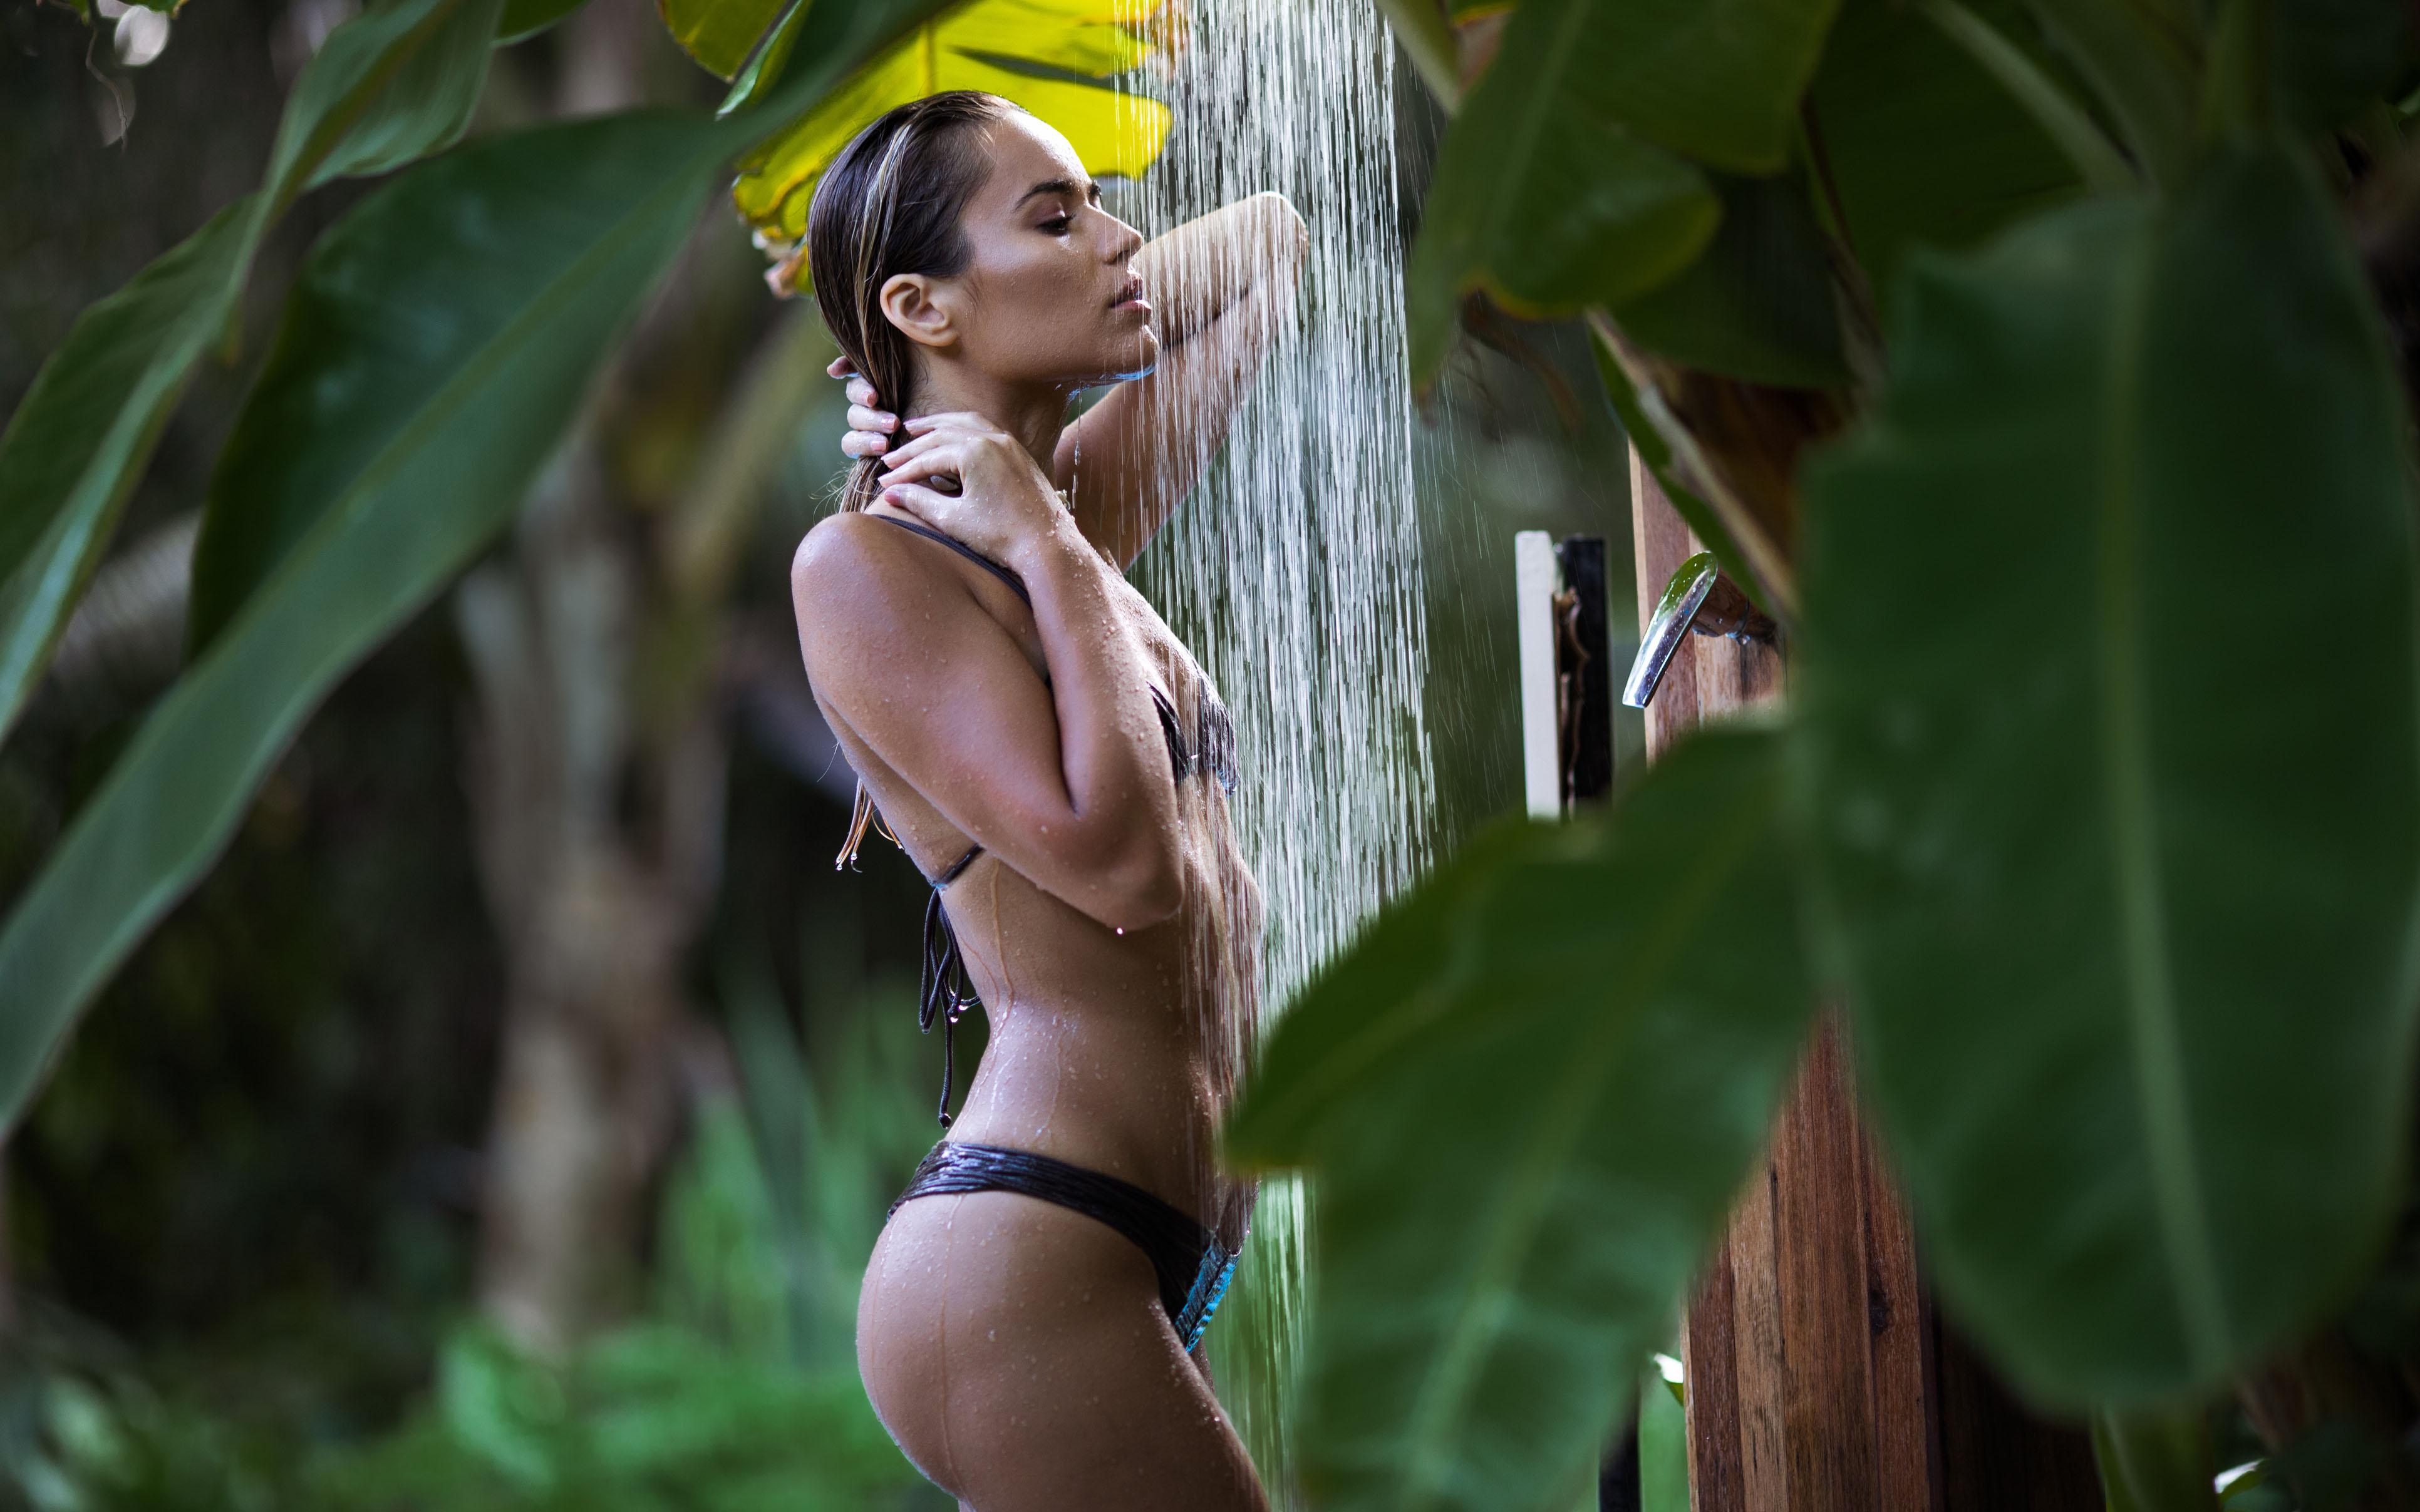 Cellulite: serve una strategia detox